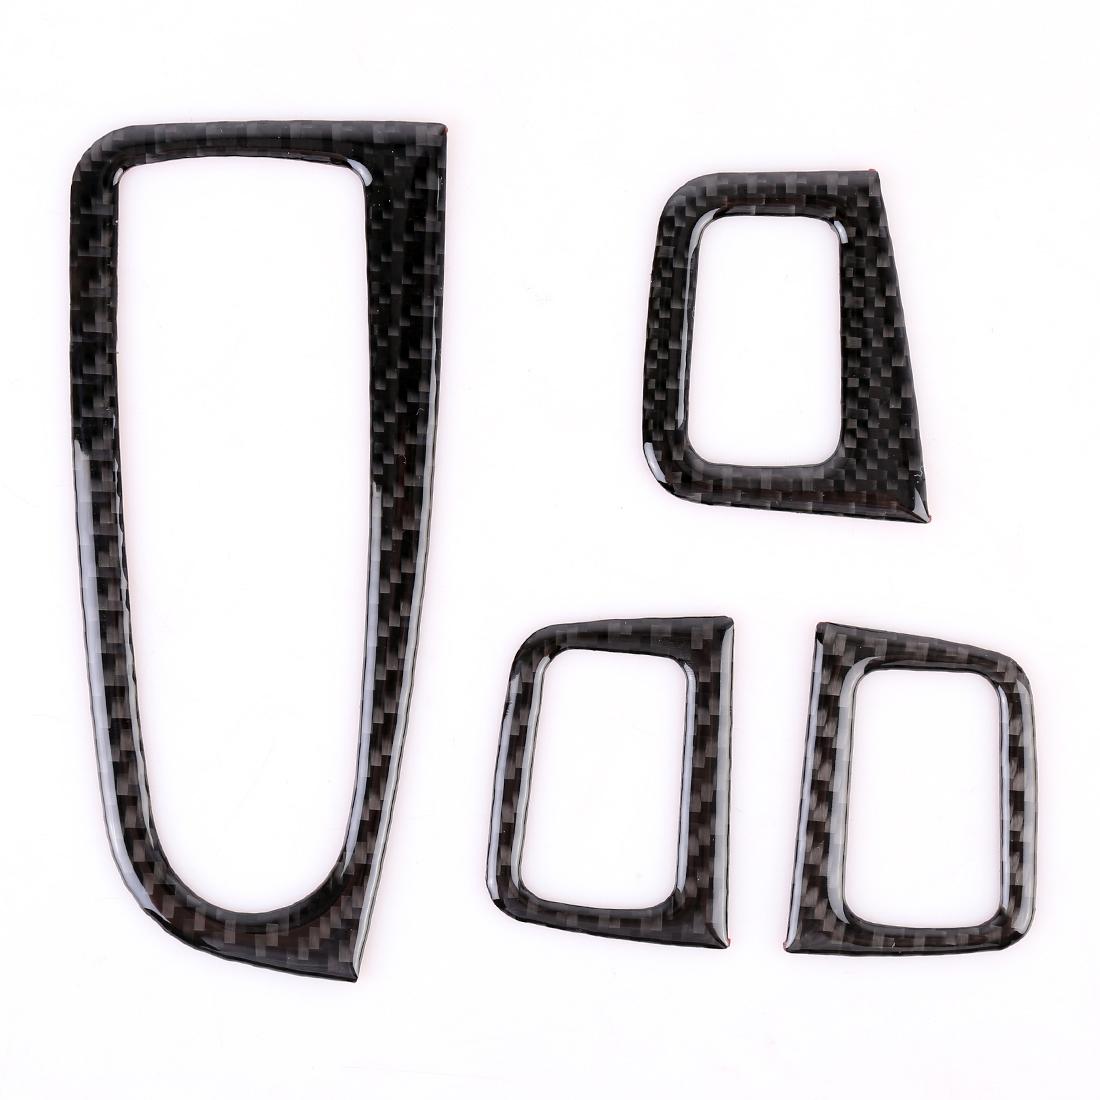 4 Pcs Car Carbon Fiber Door Lift Window Regulator Button Decorative Sticker For Mercedes Benz C